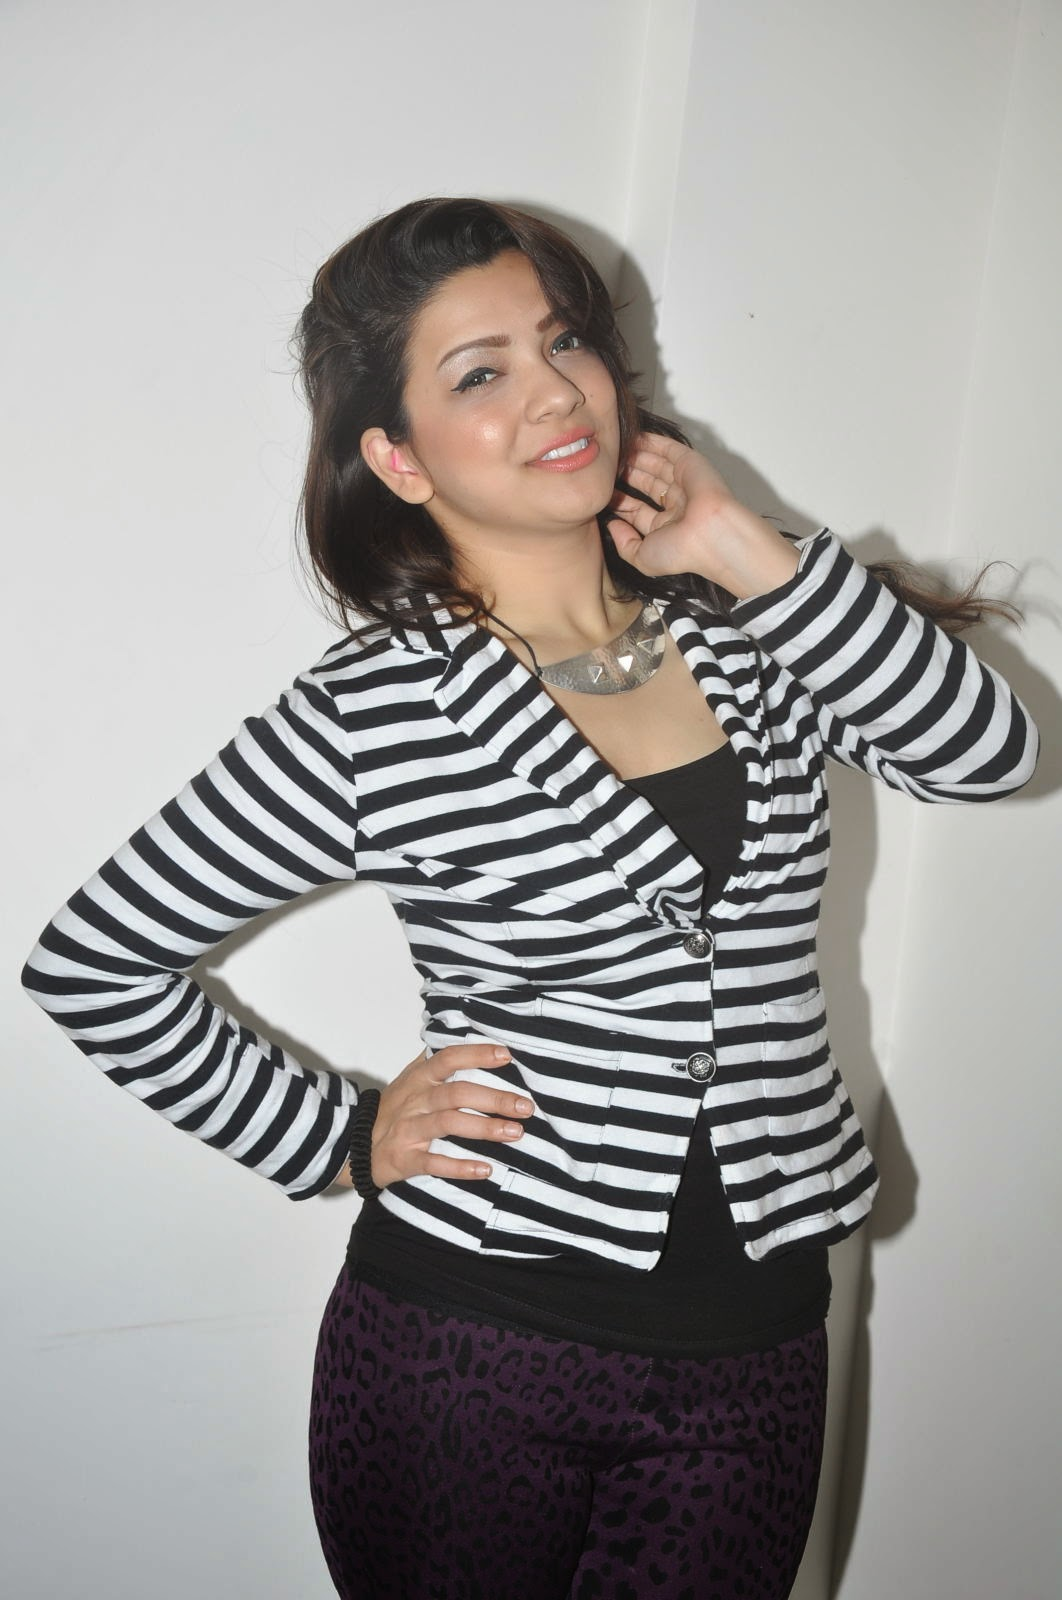 Actress Pari Nidhi Glam photos Gallery-HQ-Photo-14